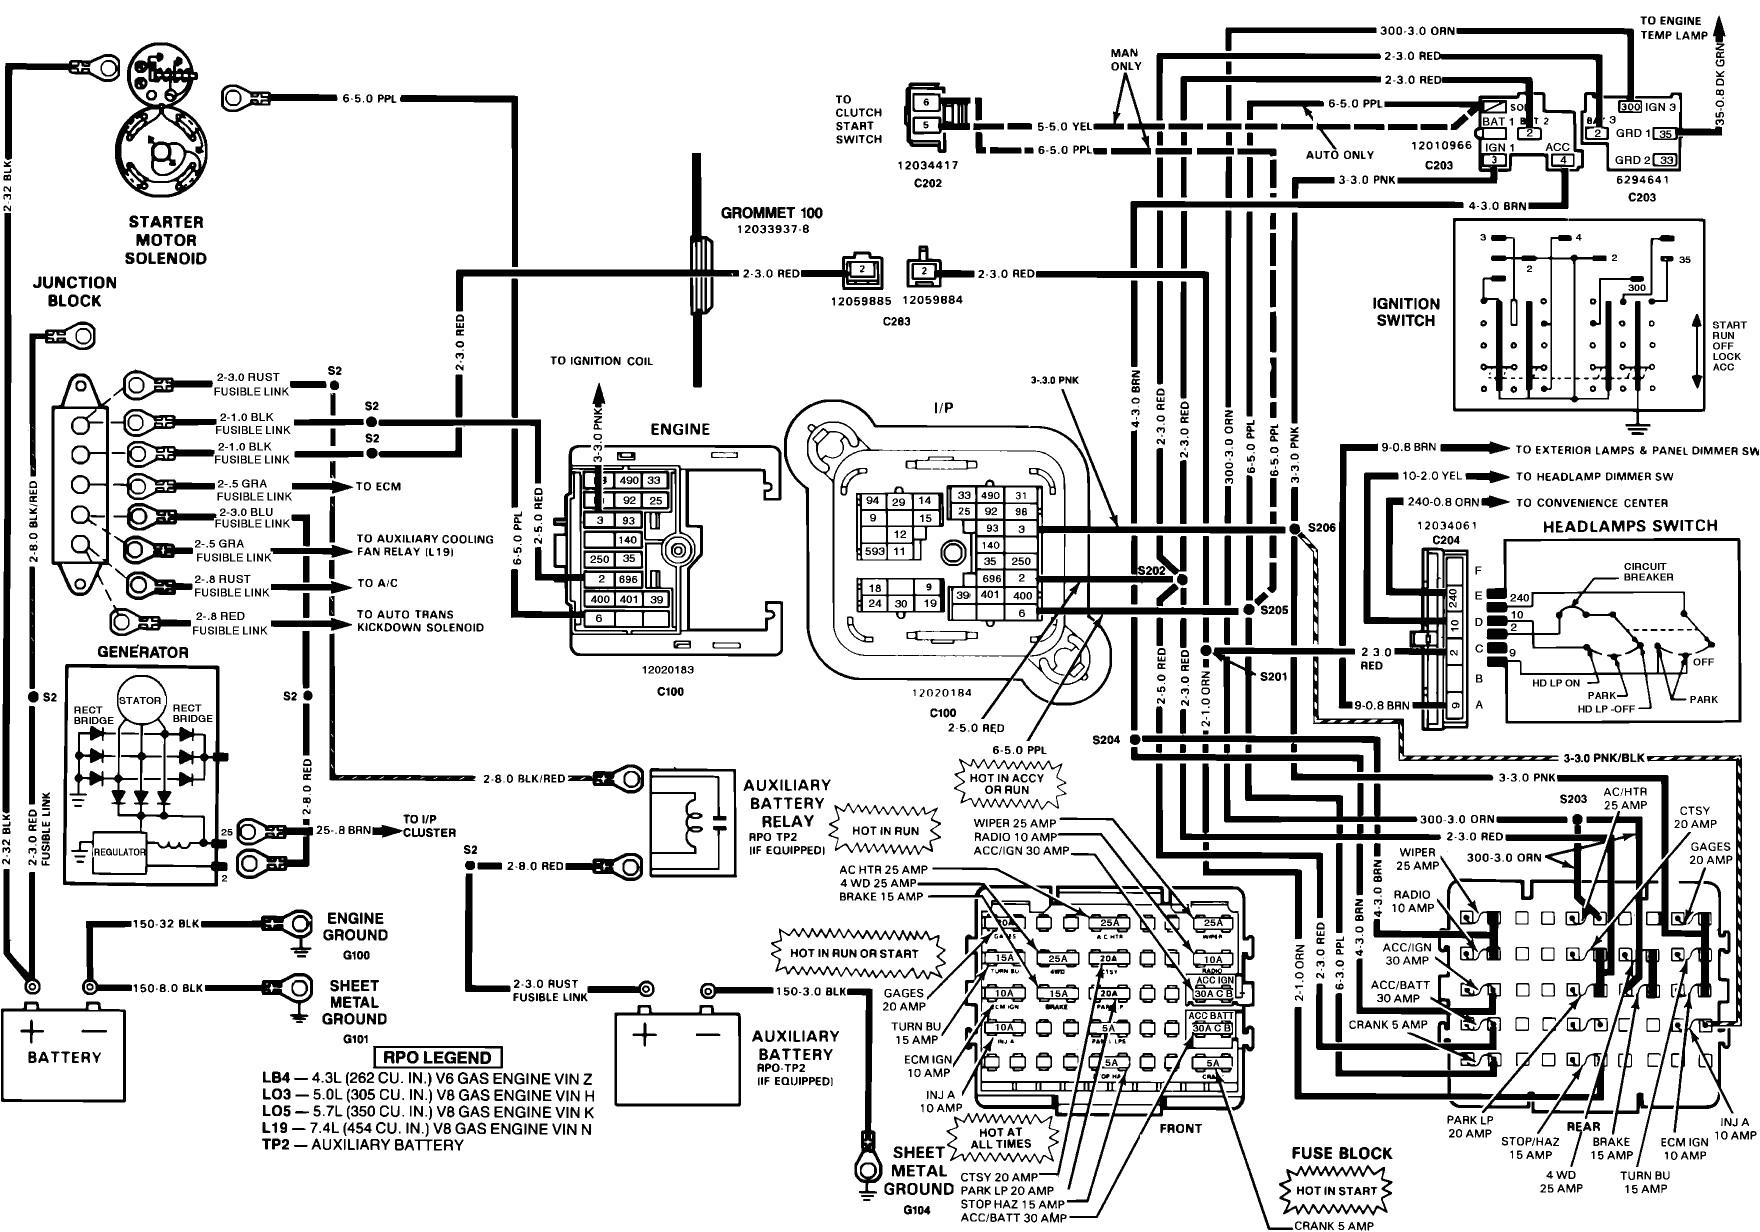 free gmc wiring diagrams data diagram schematic gmc wiring diagrams free free gmc wiring diagrams